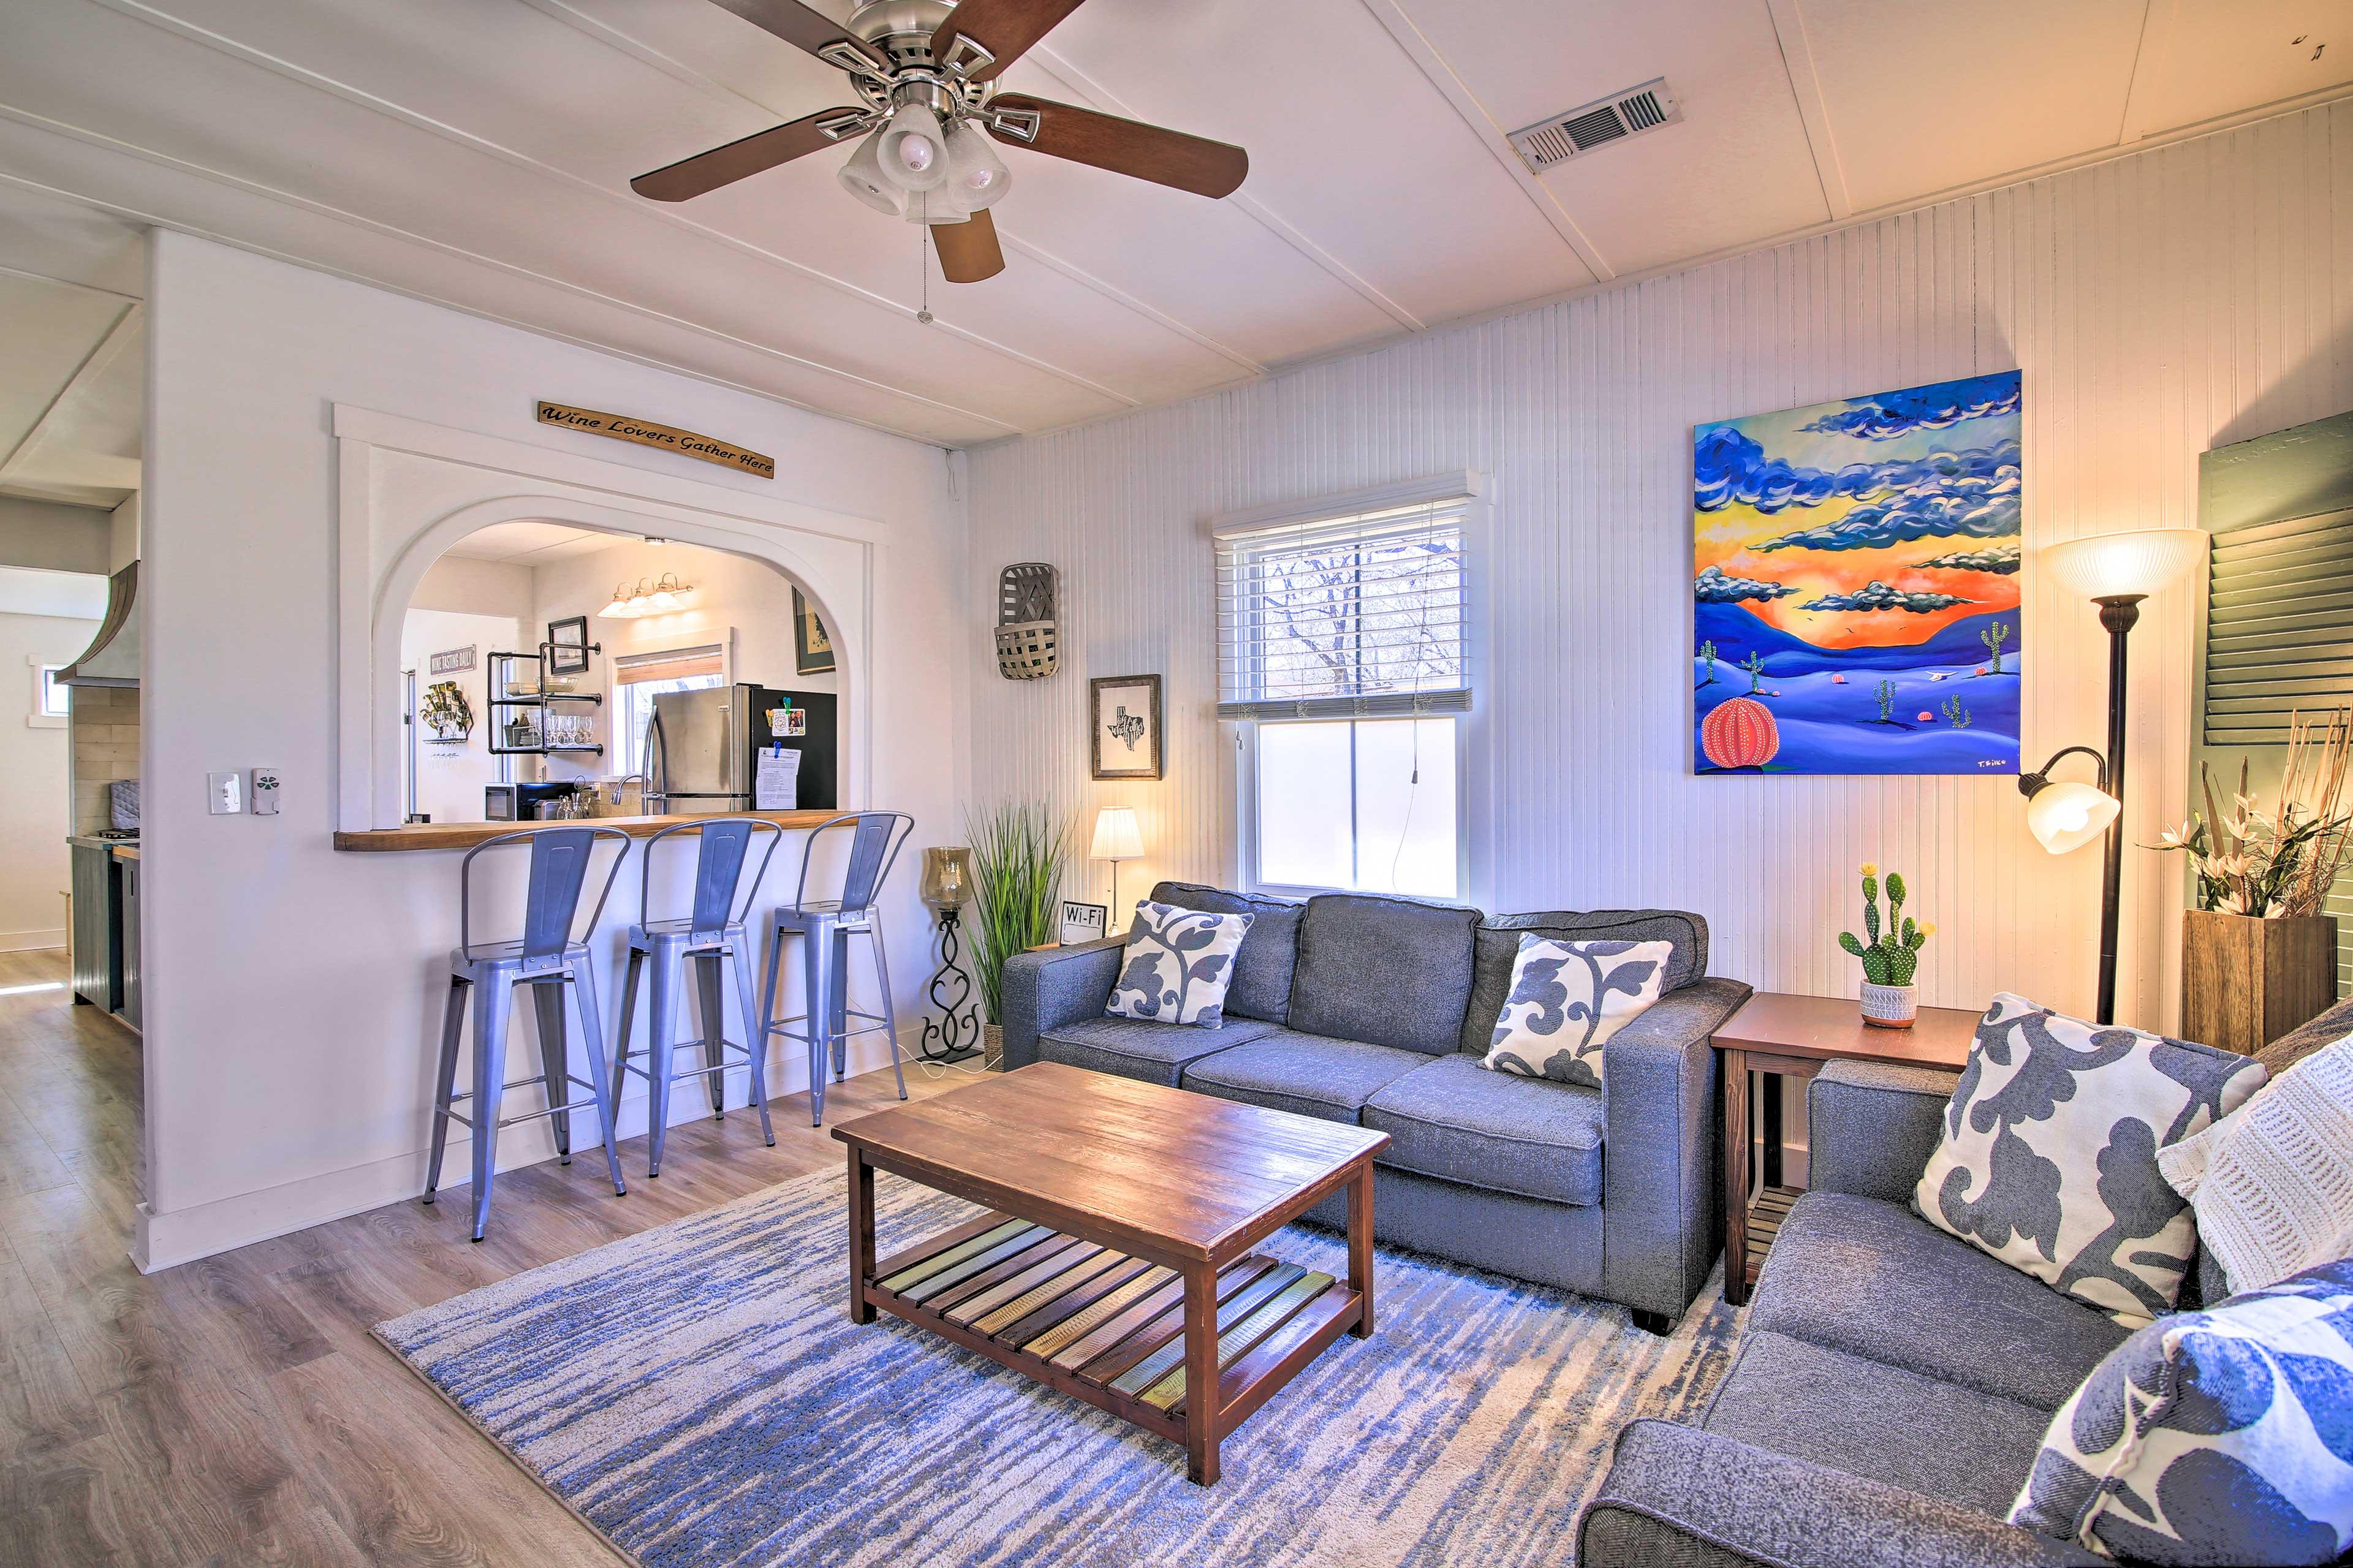 Fredericksburg Vacation Rental | 2BR | 1BA | 1,147 Sq Ft | Single Story